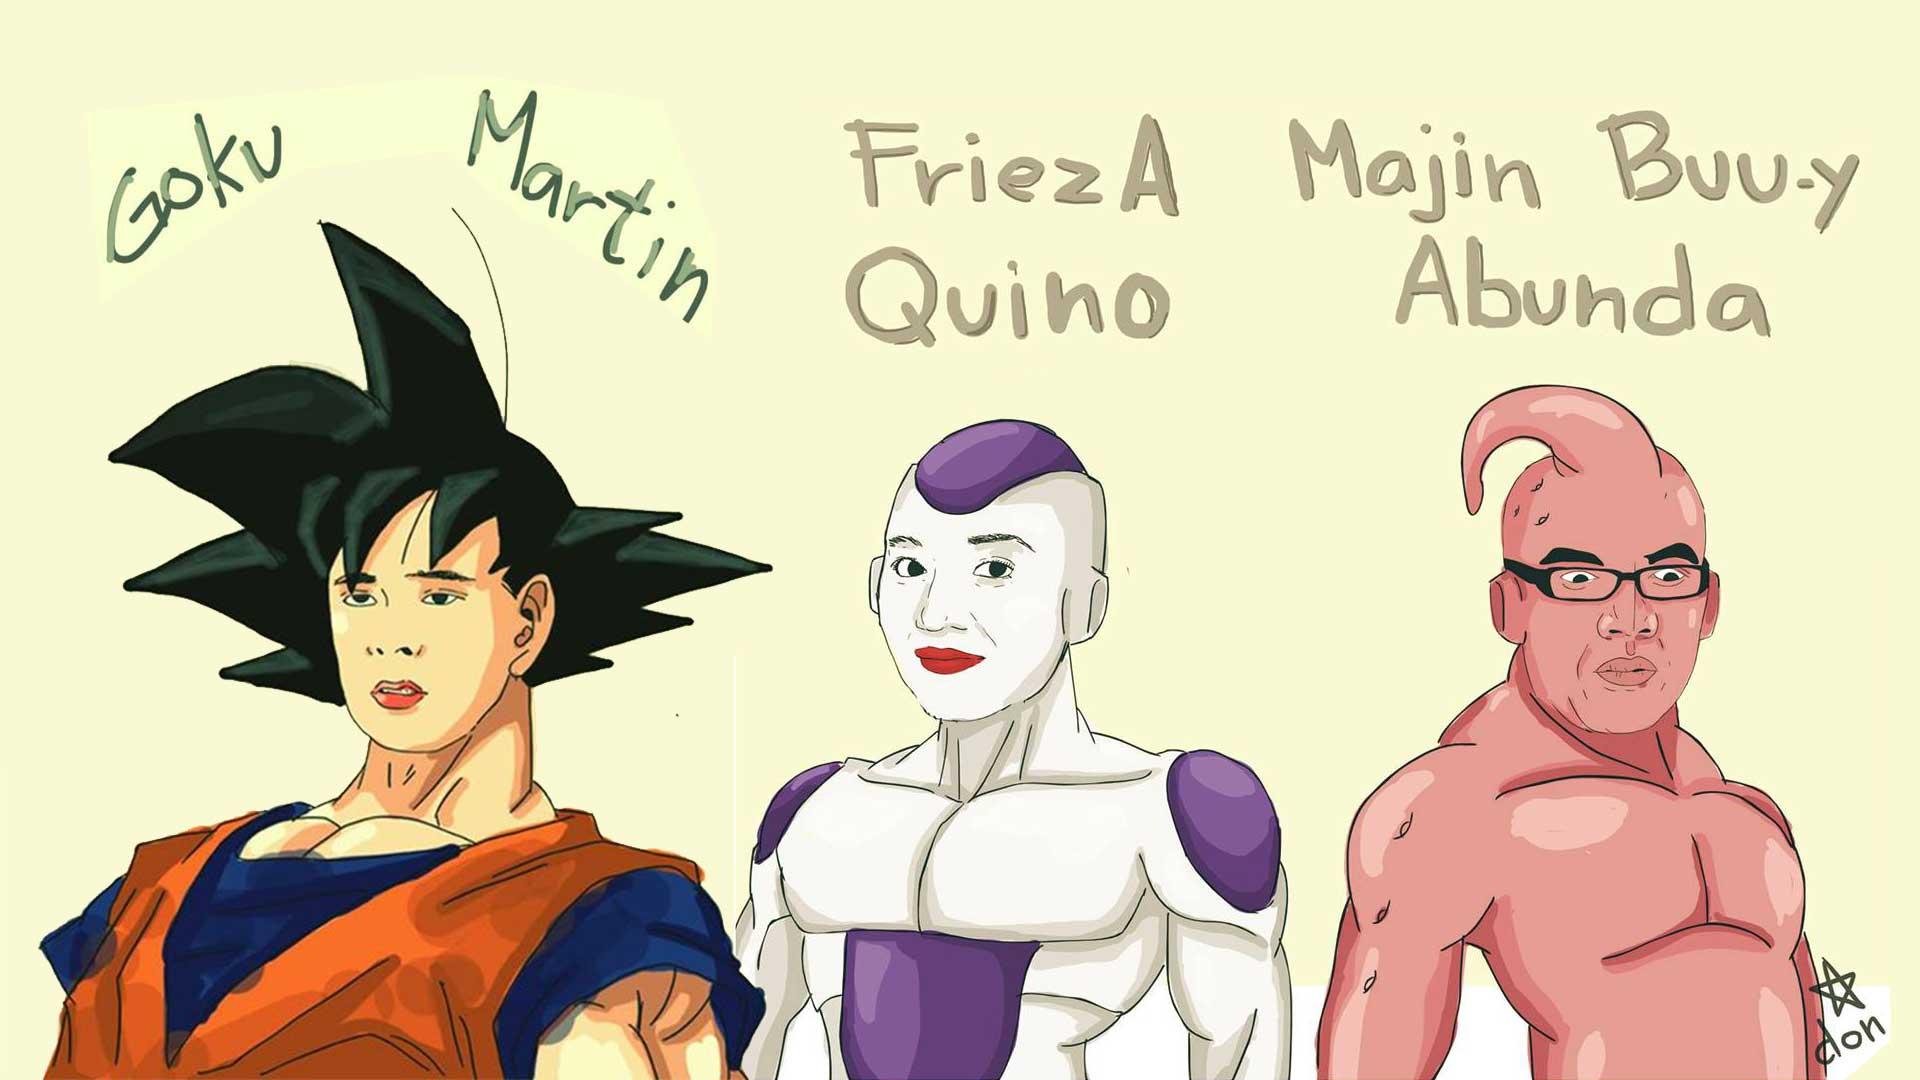 Goku Martin FriezA Quino Majin Buu-y Abunda